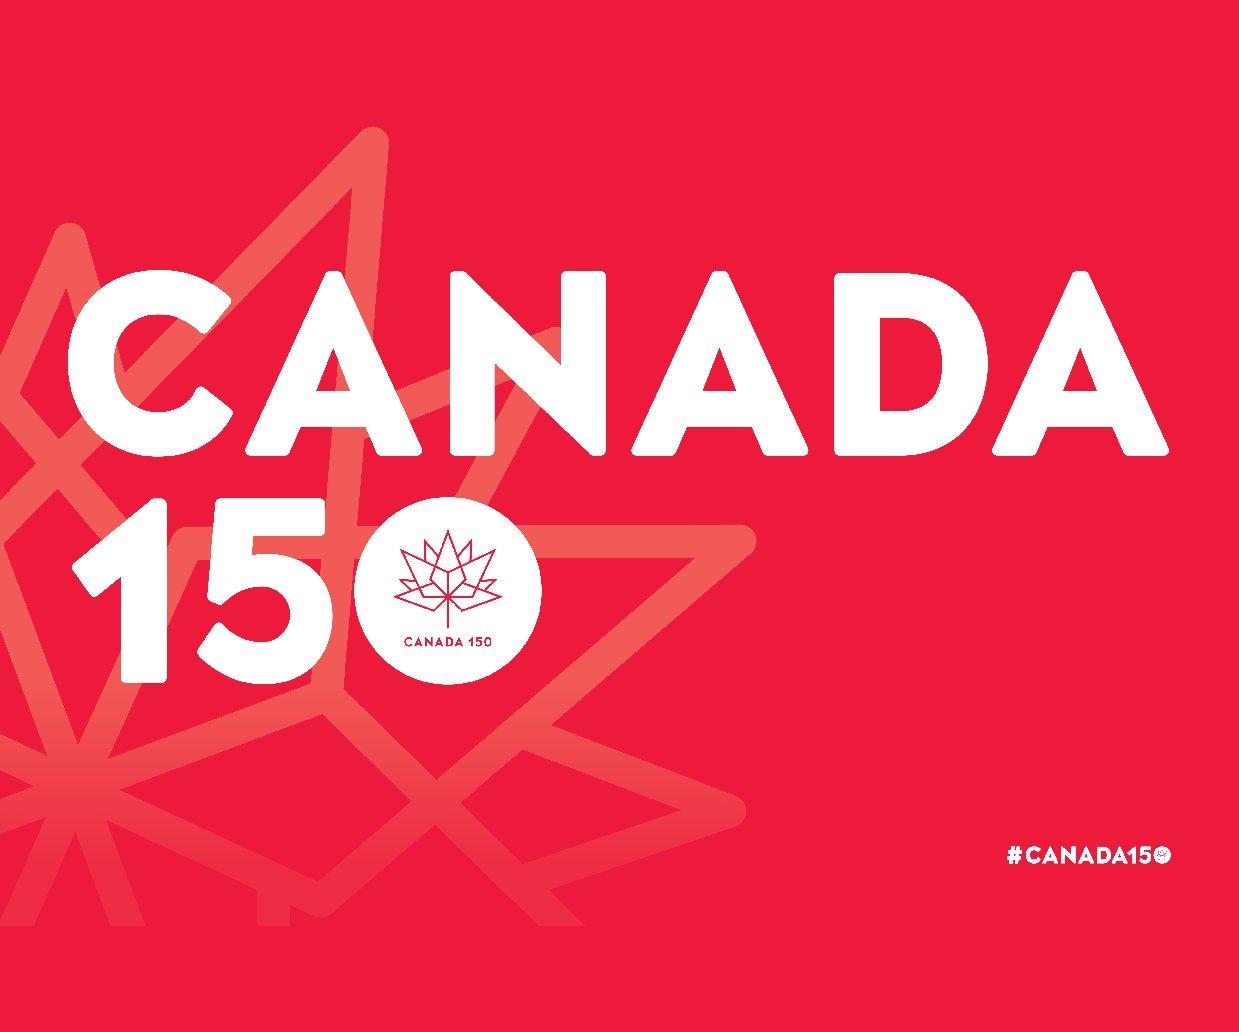 Celebrating Canada's 150th